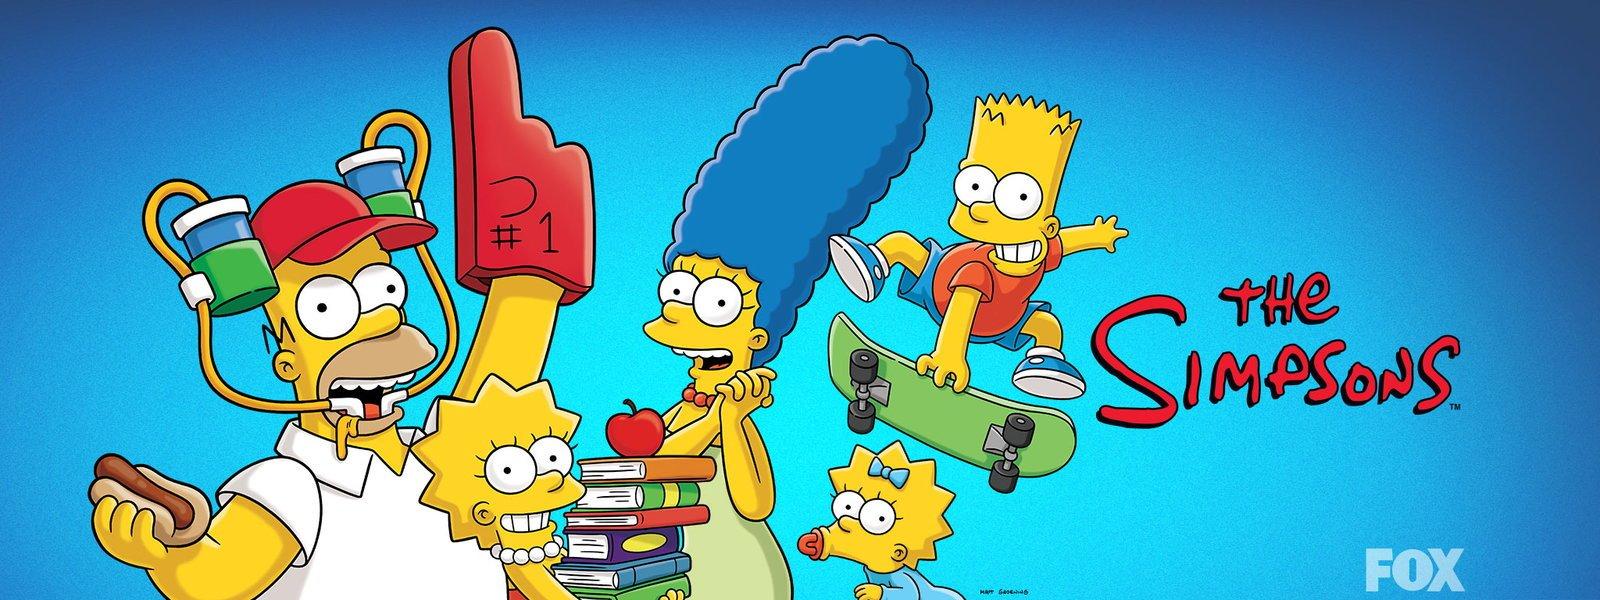 The Simpsons 27s. - Изображение 1